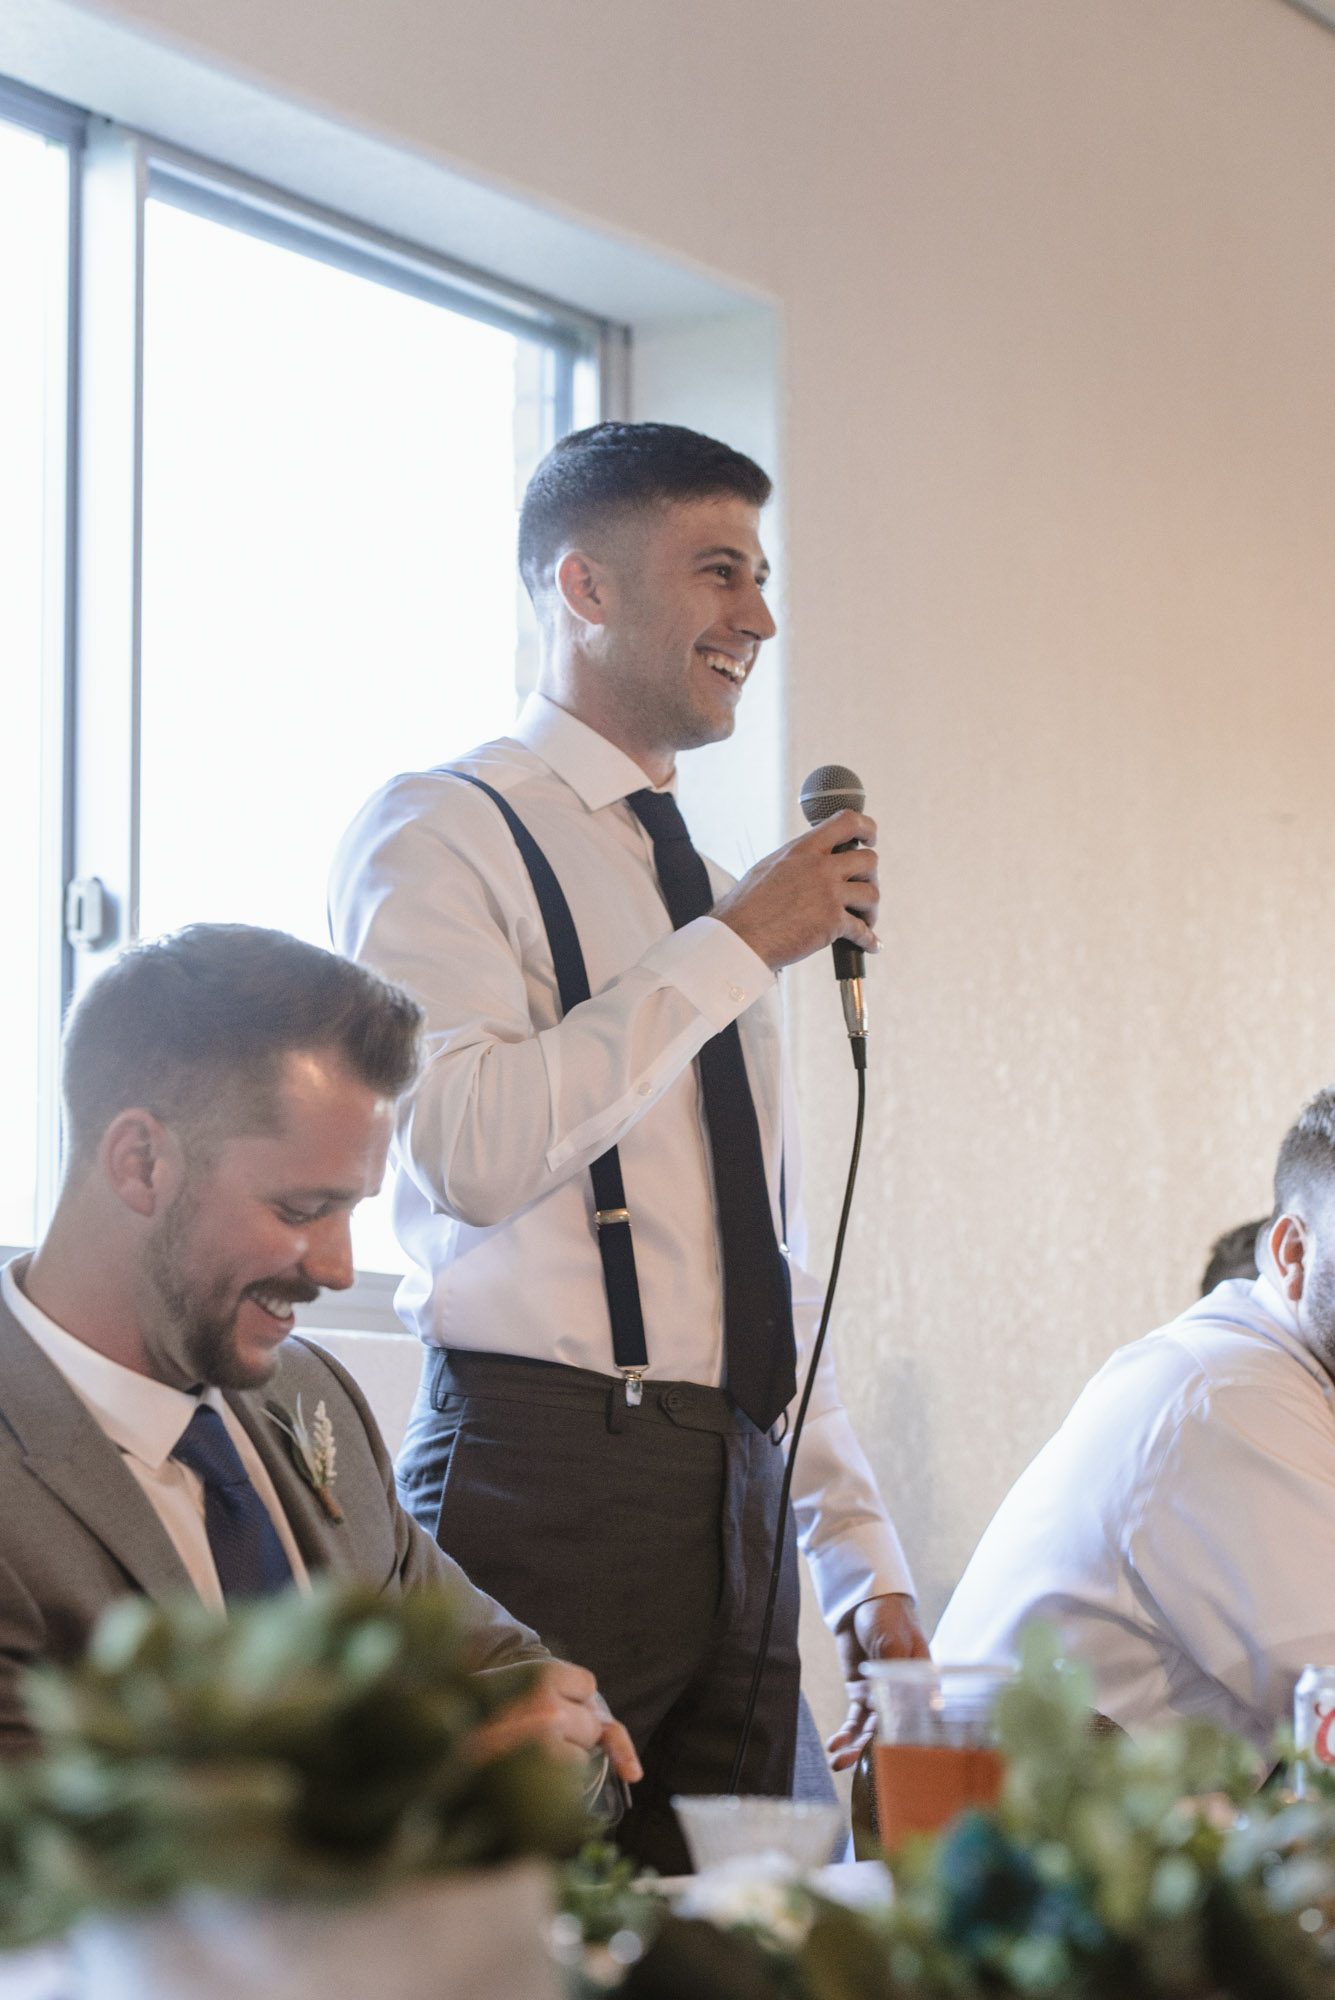 Gavyn-Taylor-Photo_Woolen-Mills-Wedding (108 of 143).jpg